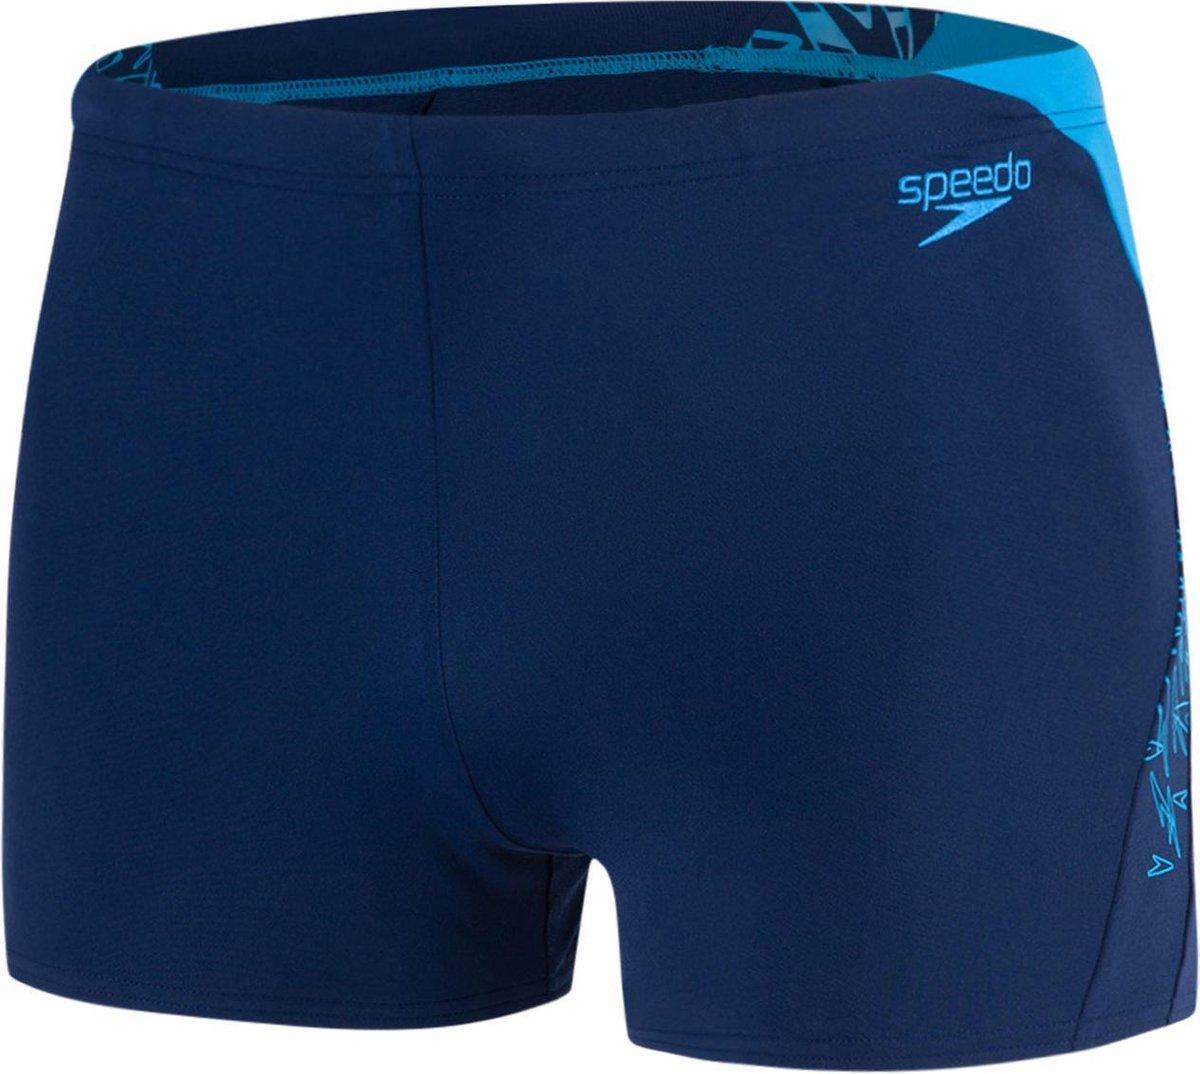 Speedo Endurance Boom Splice Aquashort Heren Zwembroek - Marine-Blauw - 7 - Speedo